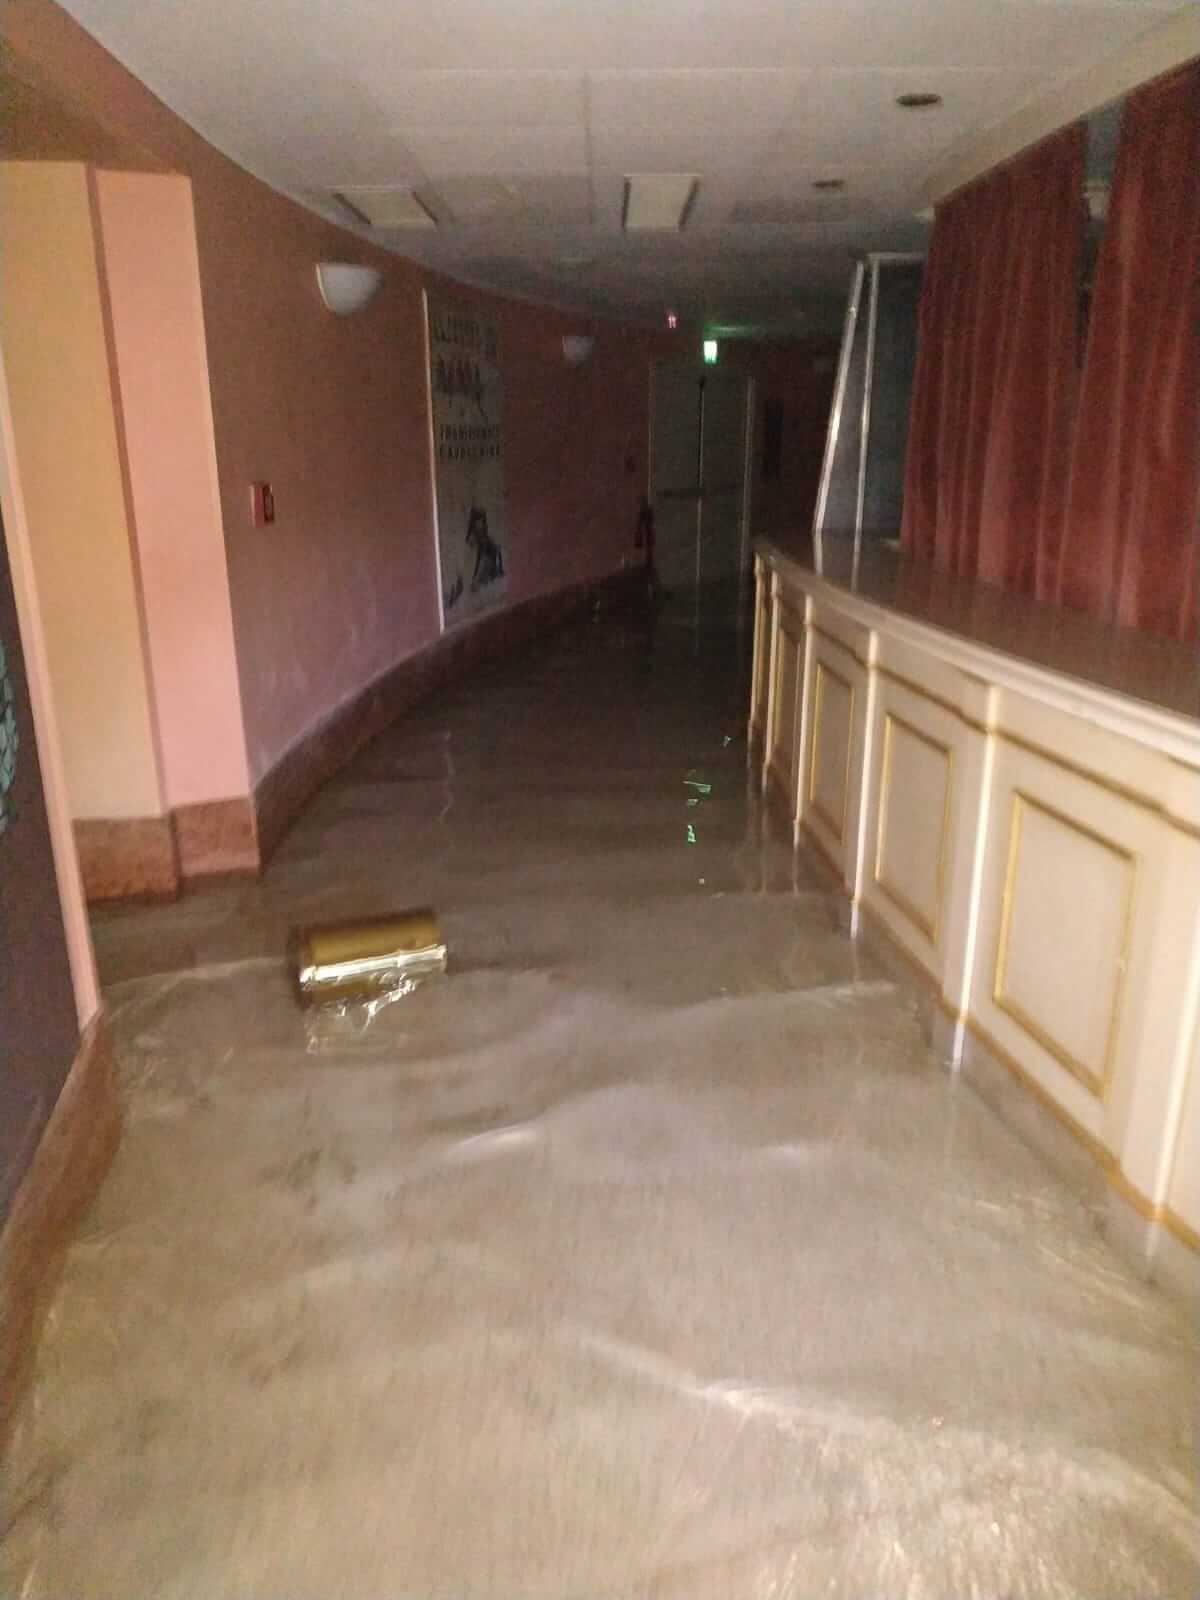 Bailout: Teatro La Fenice is under water